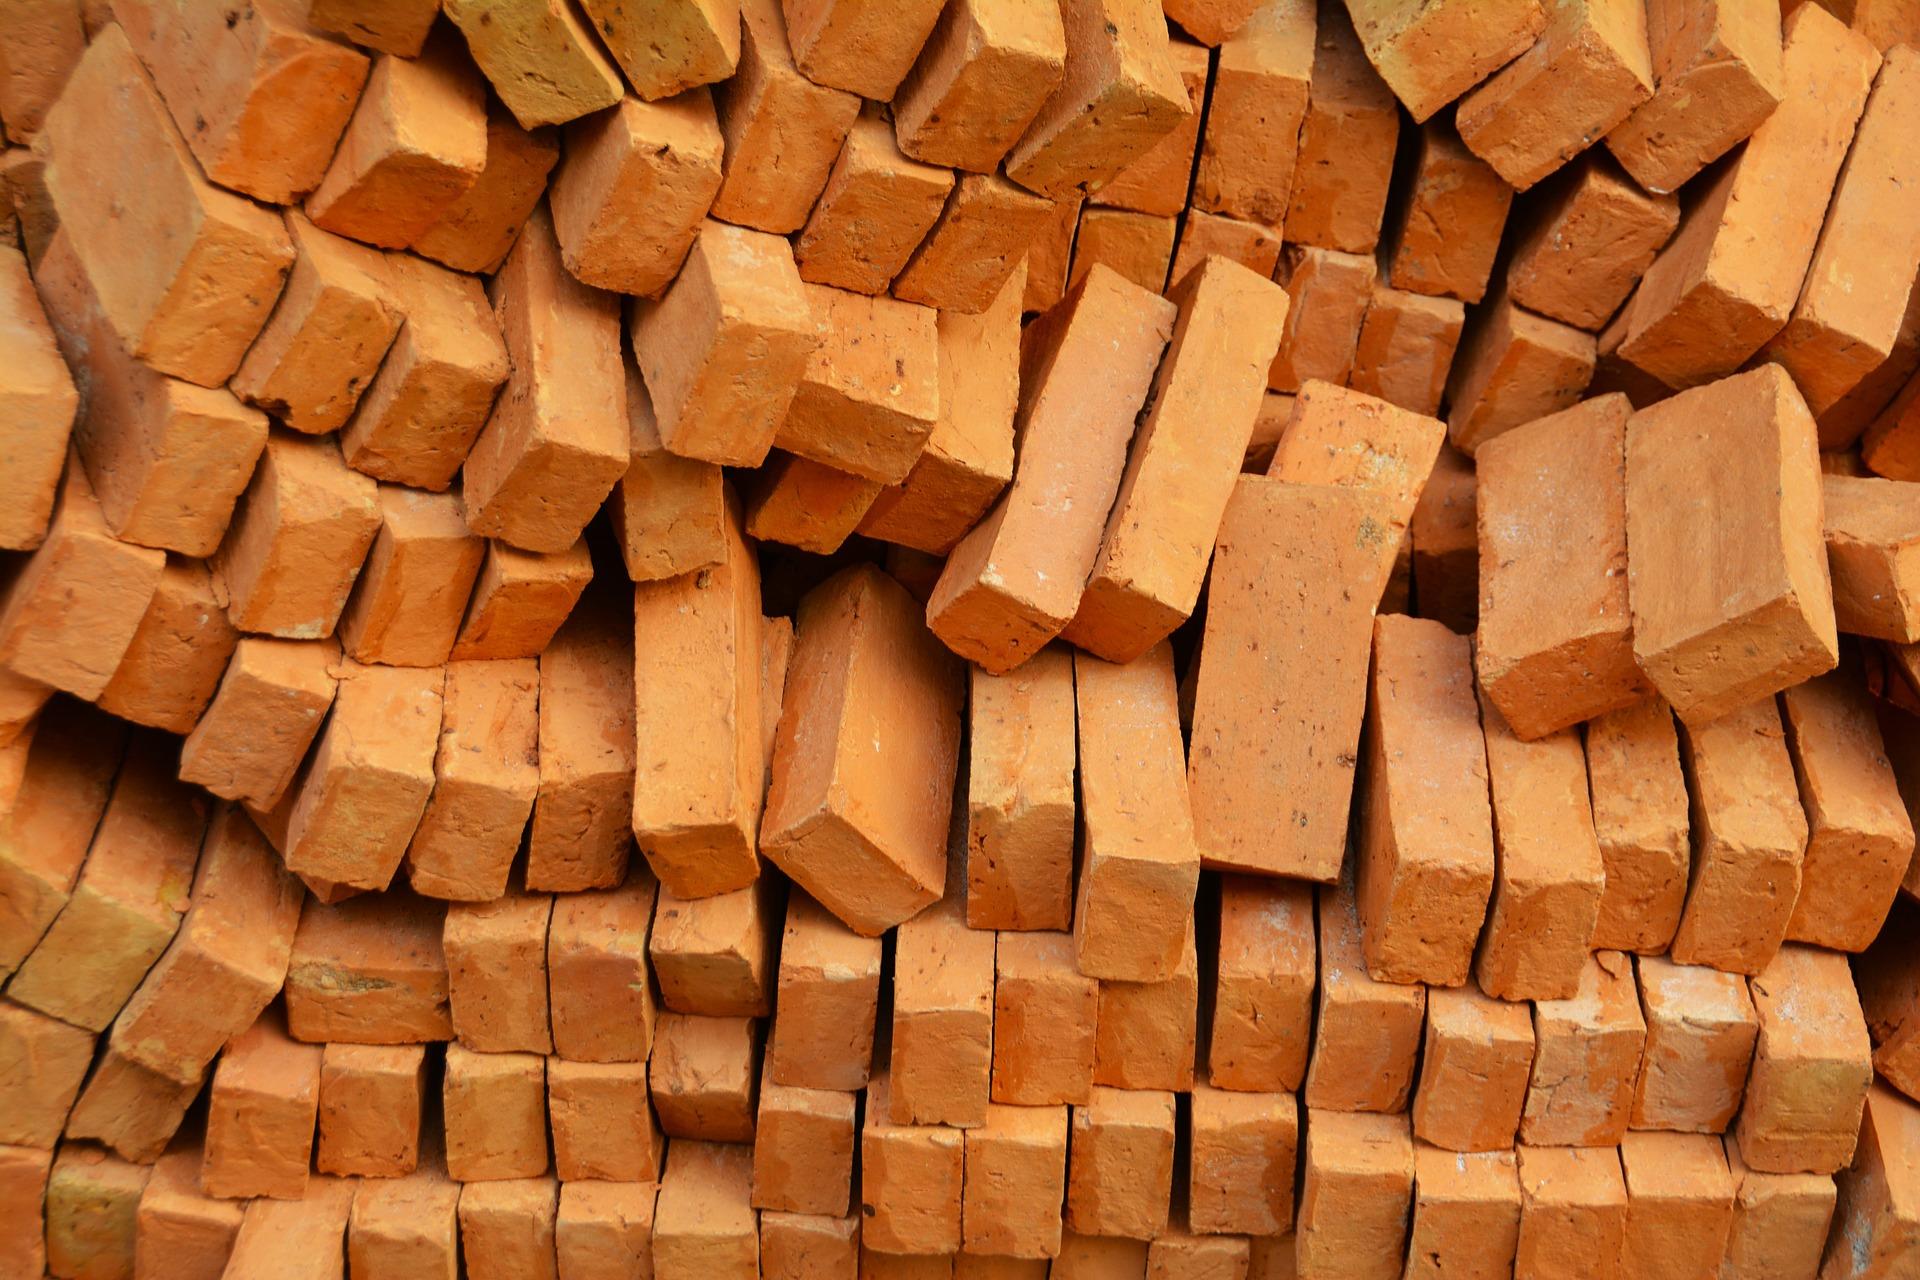 Pixabay – Housing bricks